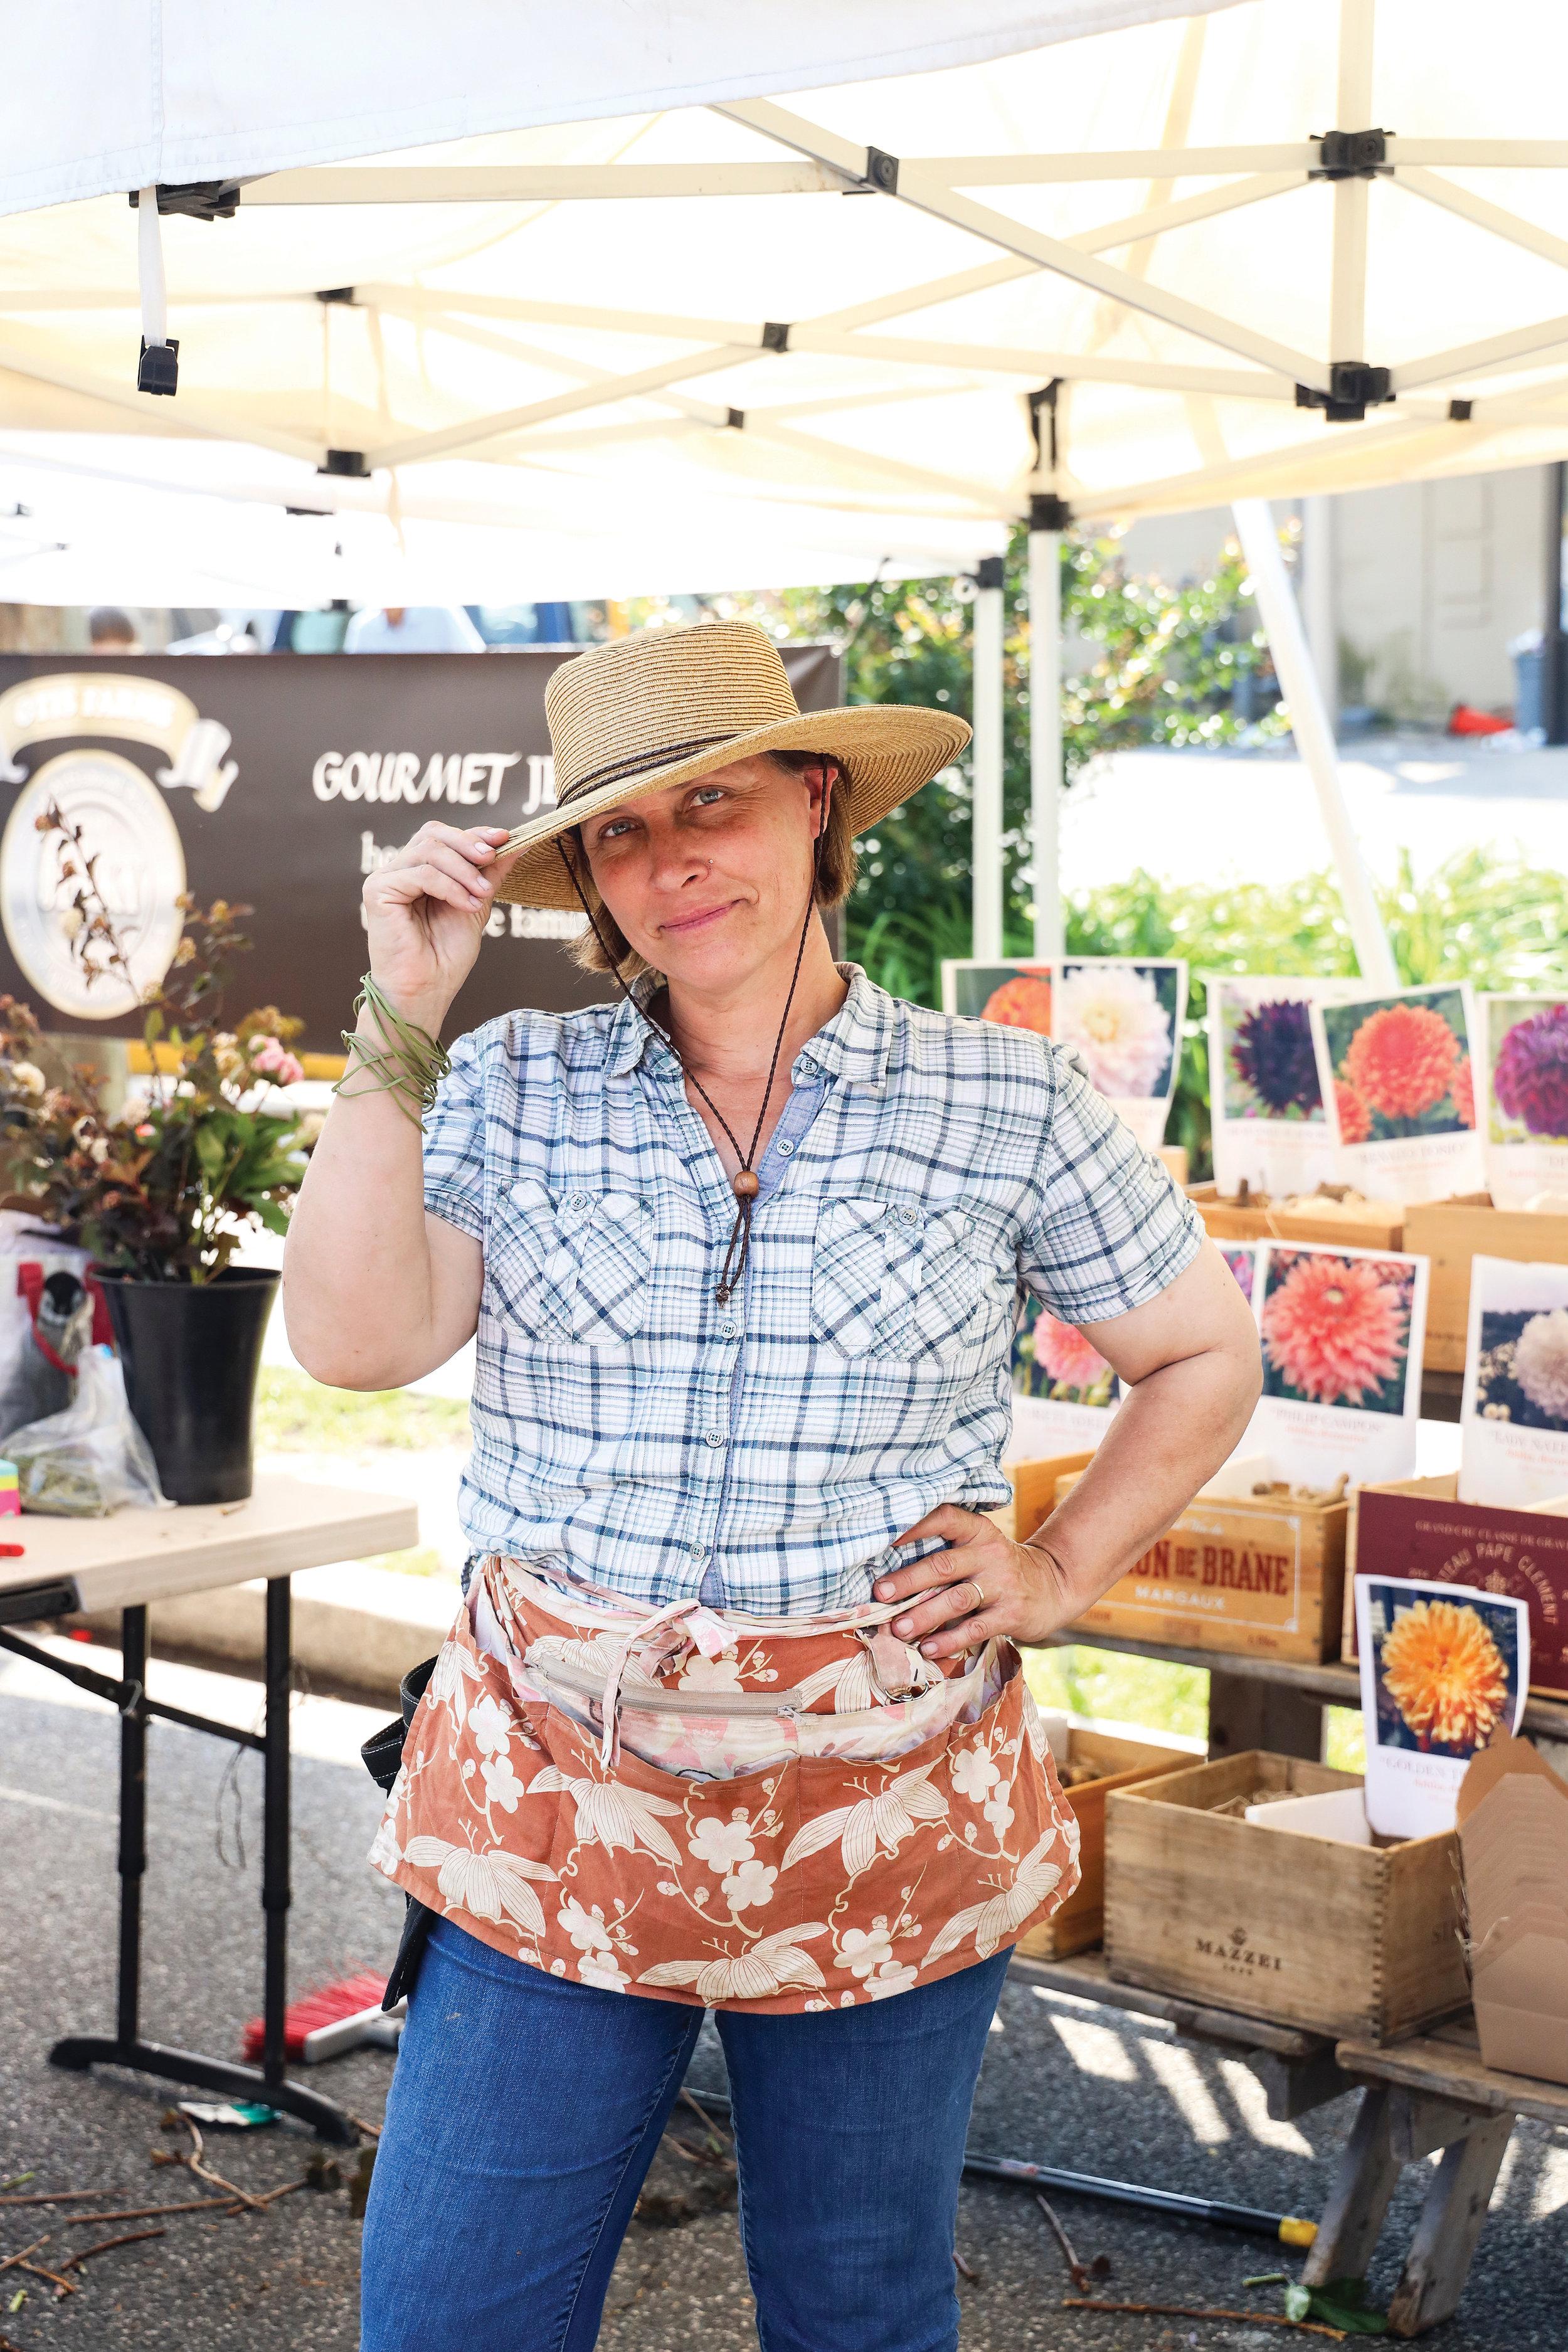 Andrea Gagnon at the Palisades Farm Market. Photo by Jennifer Chase